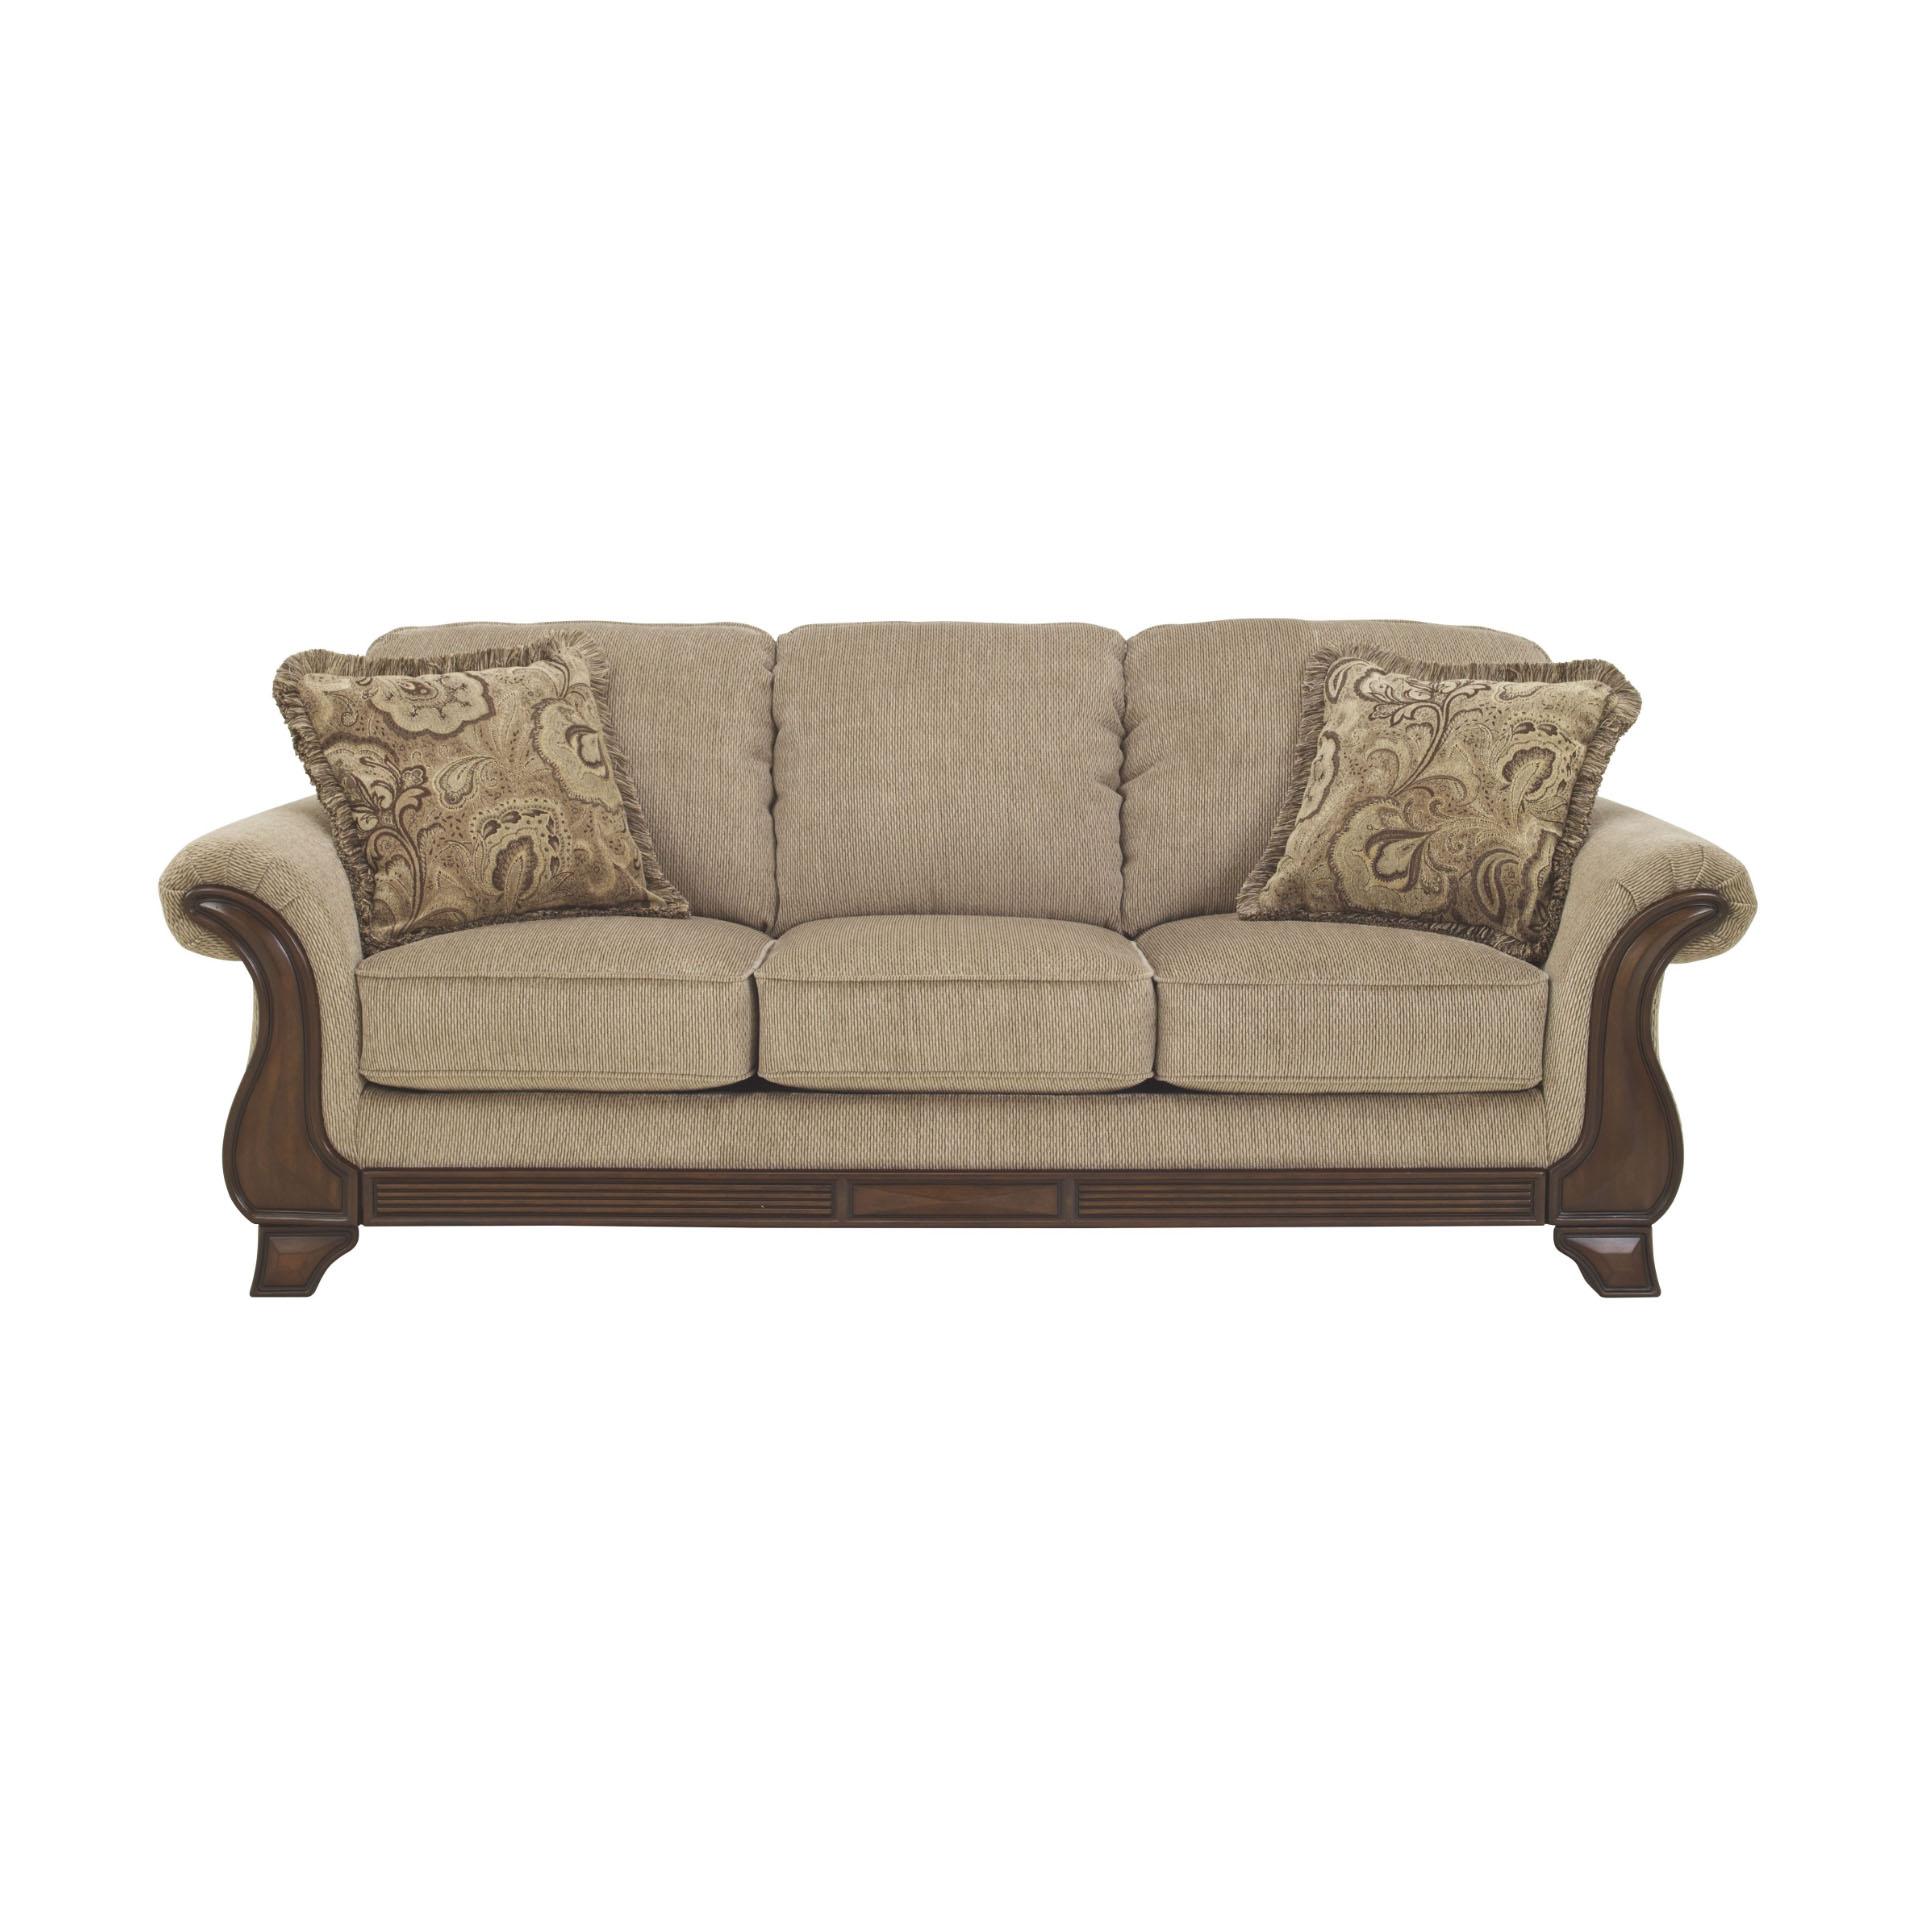 Lanett - Barley - Sofa